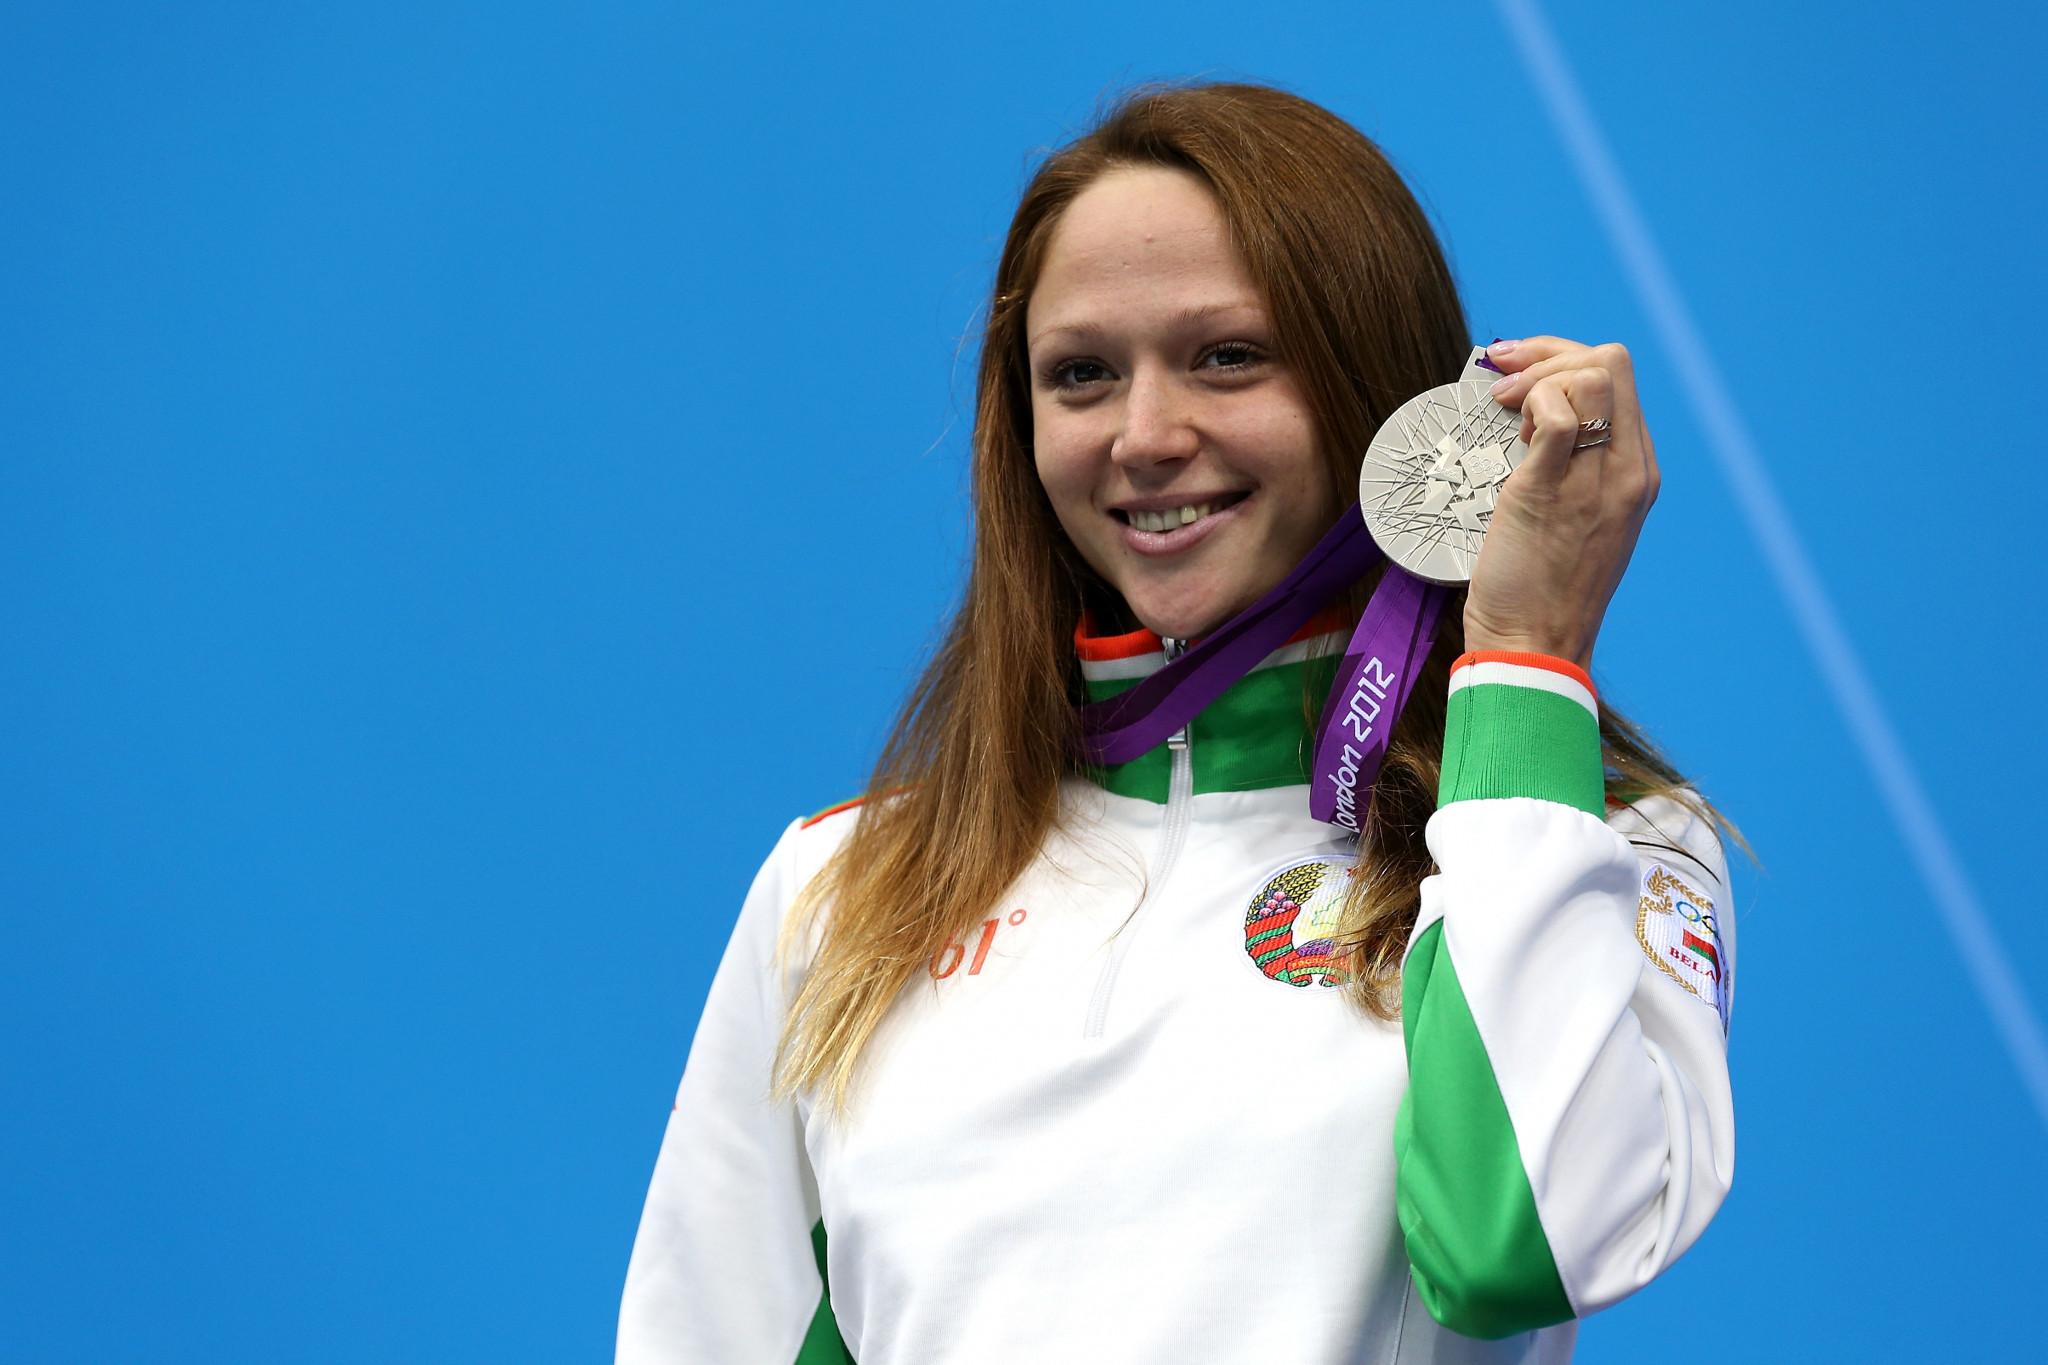 Aliaksandra Herasimenia is a three-time Olympic medallist for Belarus ©Getty Images